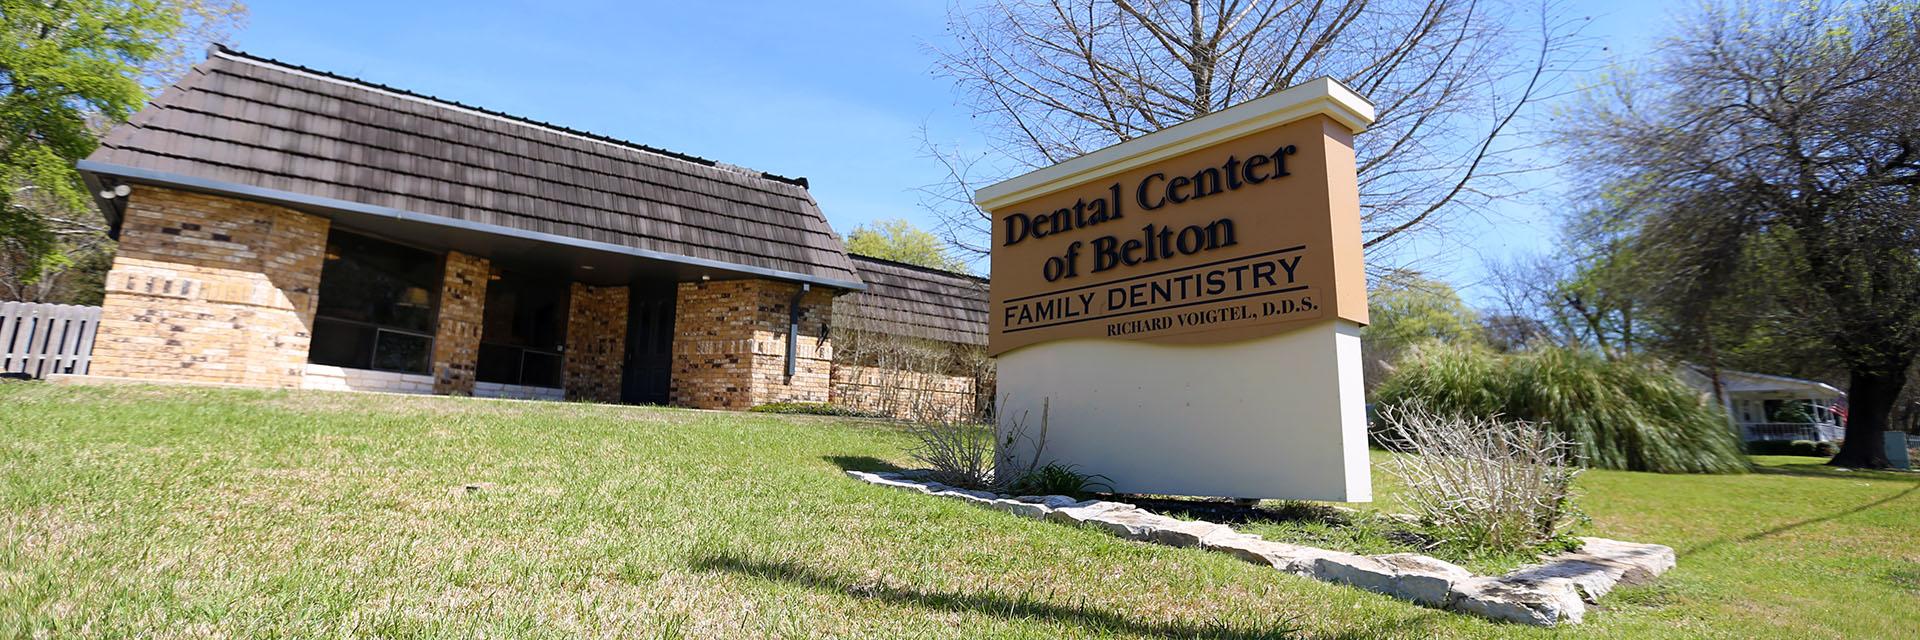 Dental Center of Belton office building